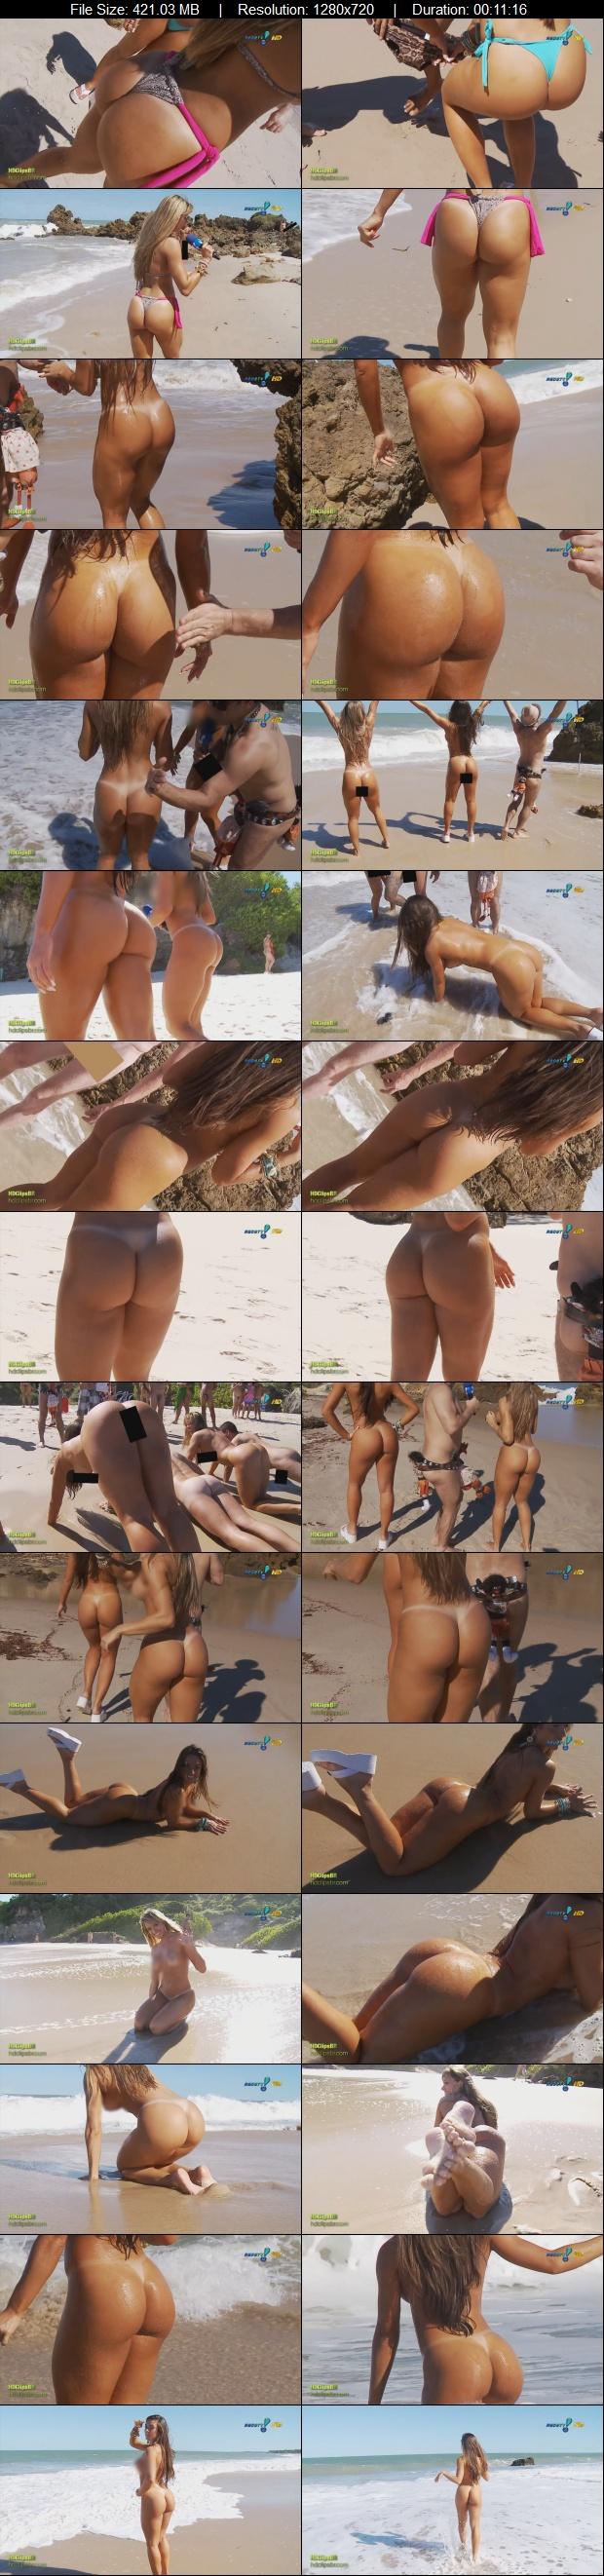 Brazilian reporters in a nudist beach (HD video) - Nicole Bahls and Juliana Salimeni. Foto 174 (Бразильские журналисты в нудистский пляж (HD Video) - Николь Bahls и Юлиана Salimeni. Фото 174)